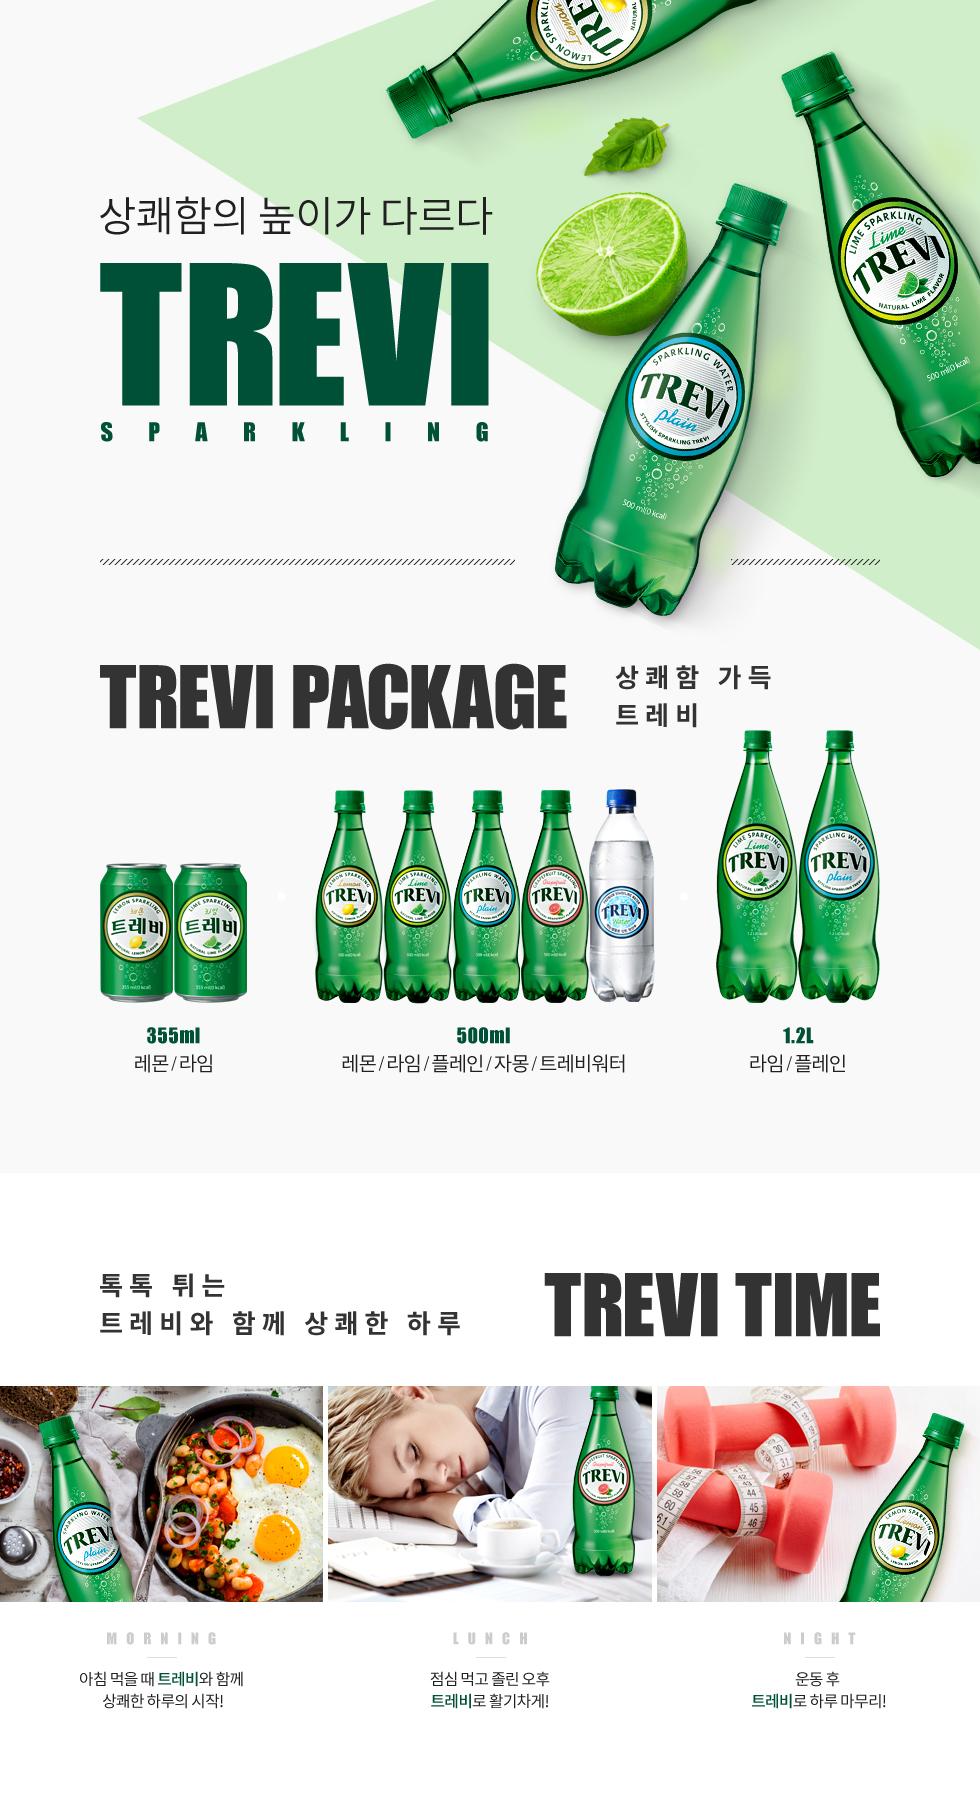 TREVI Sparkling water, 상쾌함의 높이가 다르다. 천연 과일향과 탄산이 만나 상쾌함은 높이고 스타일은 살린다.